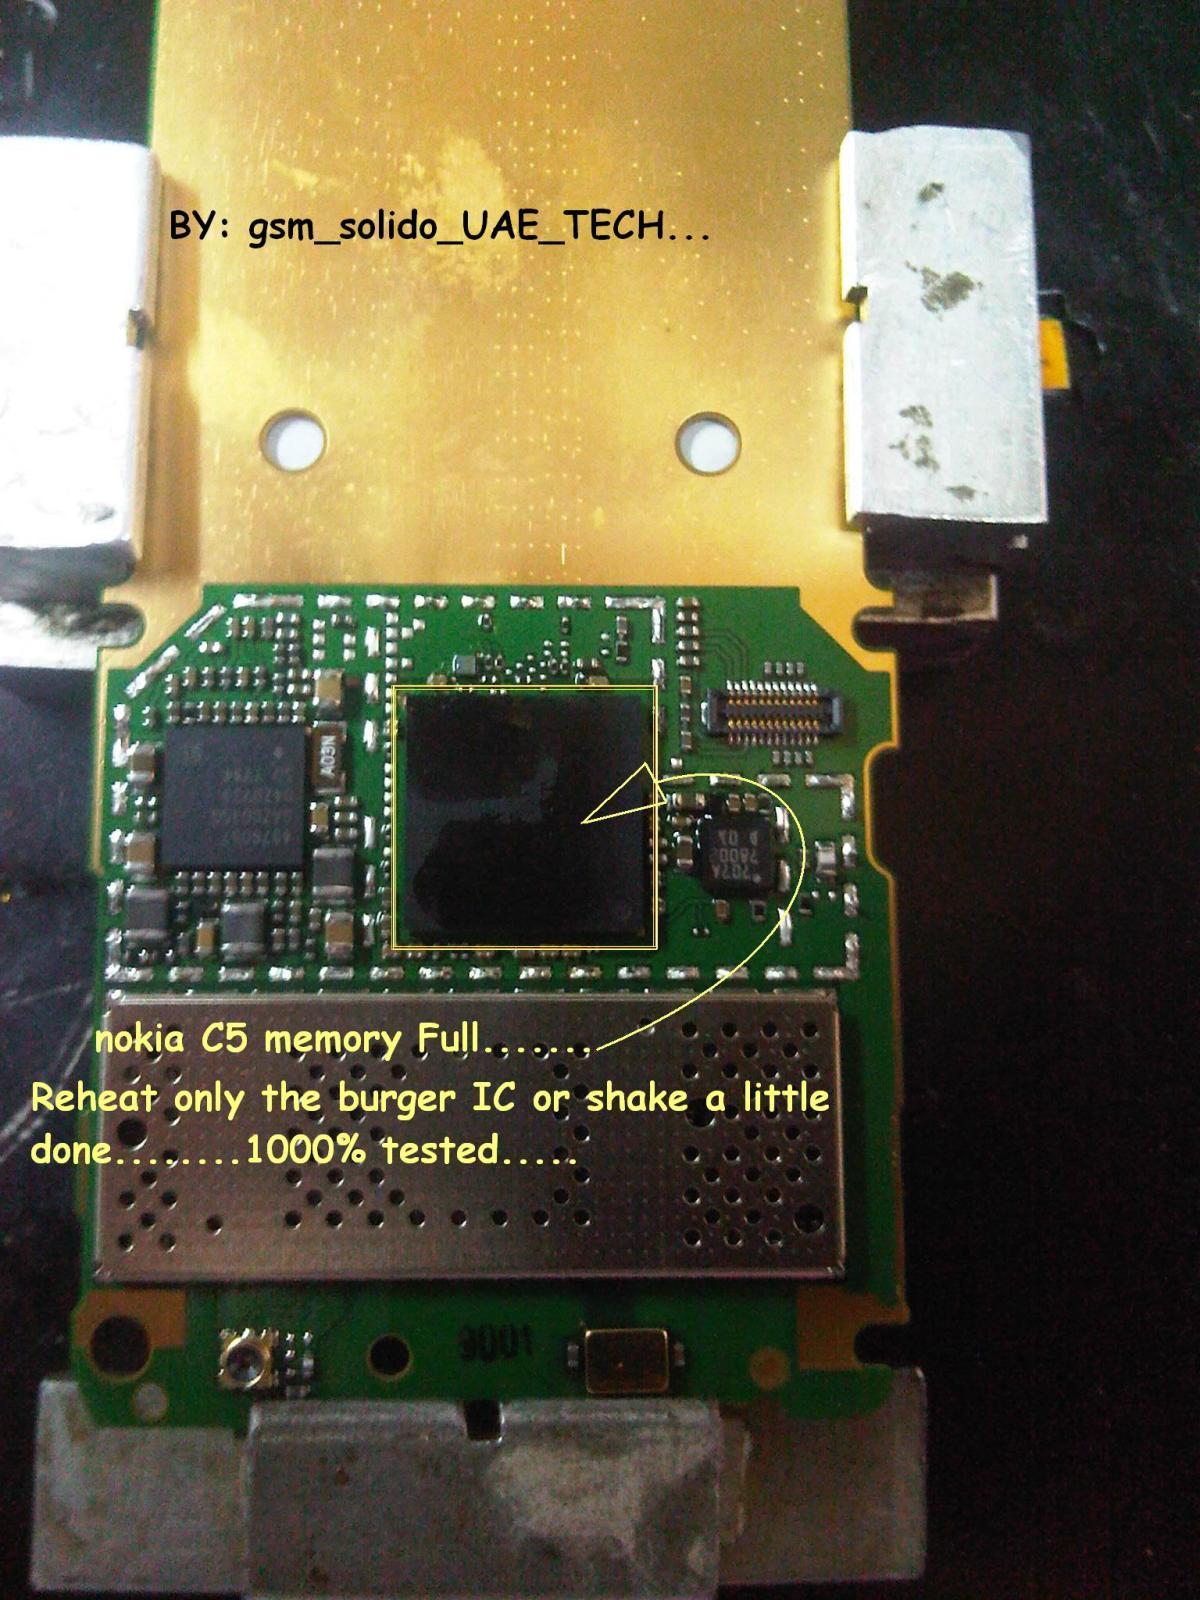 http://3.bp.blogspot.com/_ax3W4B8u-h4/TLGW0_GsDJI/AAAAAAAACWA/3Nv2oRQyfiY/s1600/Nokia+c5+memory+full++Solution+5.jpg